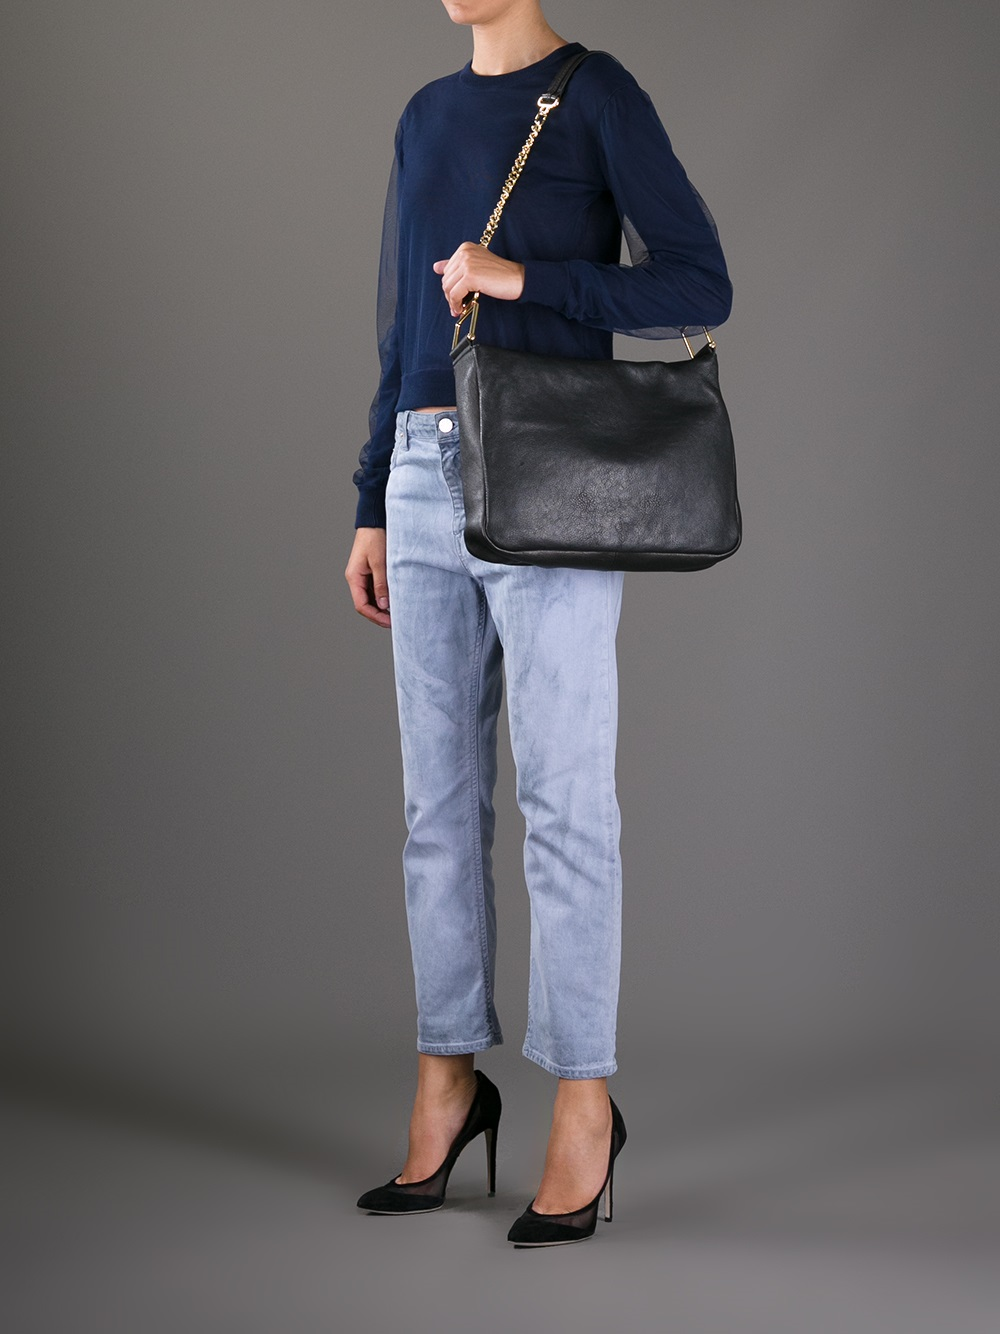 chloe handbags knockoffs - chloe vanessa bag, clohe handbags